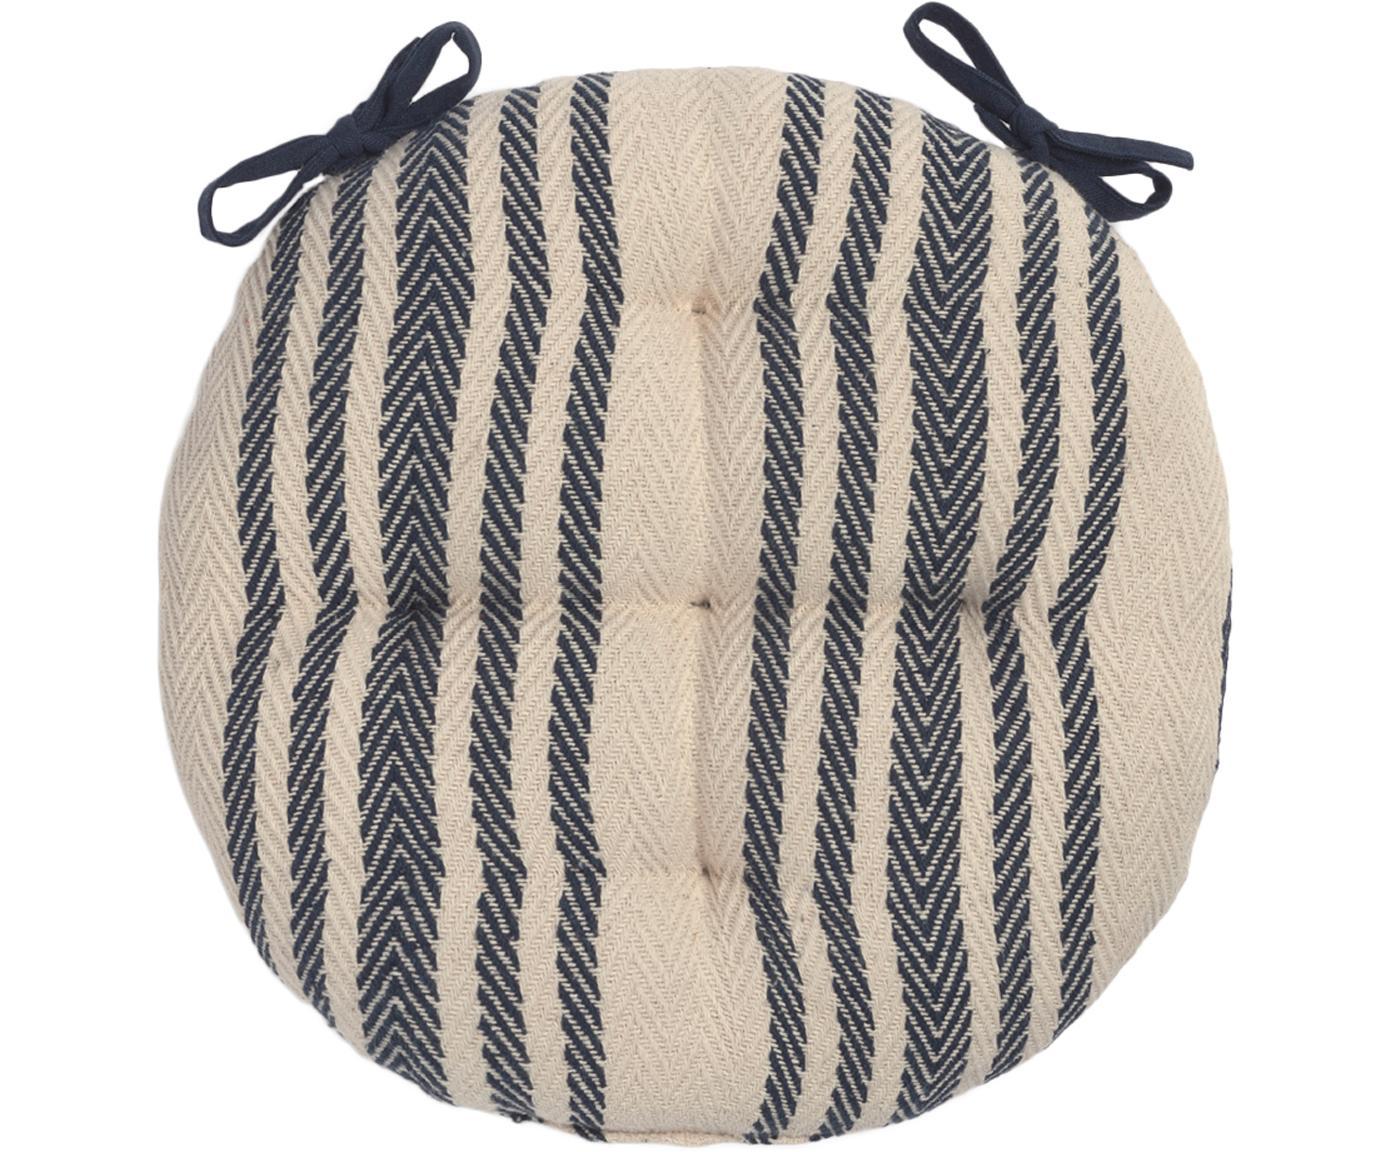 Cuscino sedia Puket, Blu scuro, bianco, Ø 40 cm